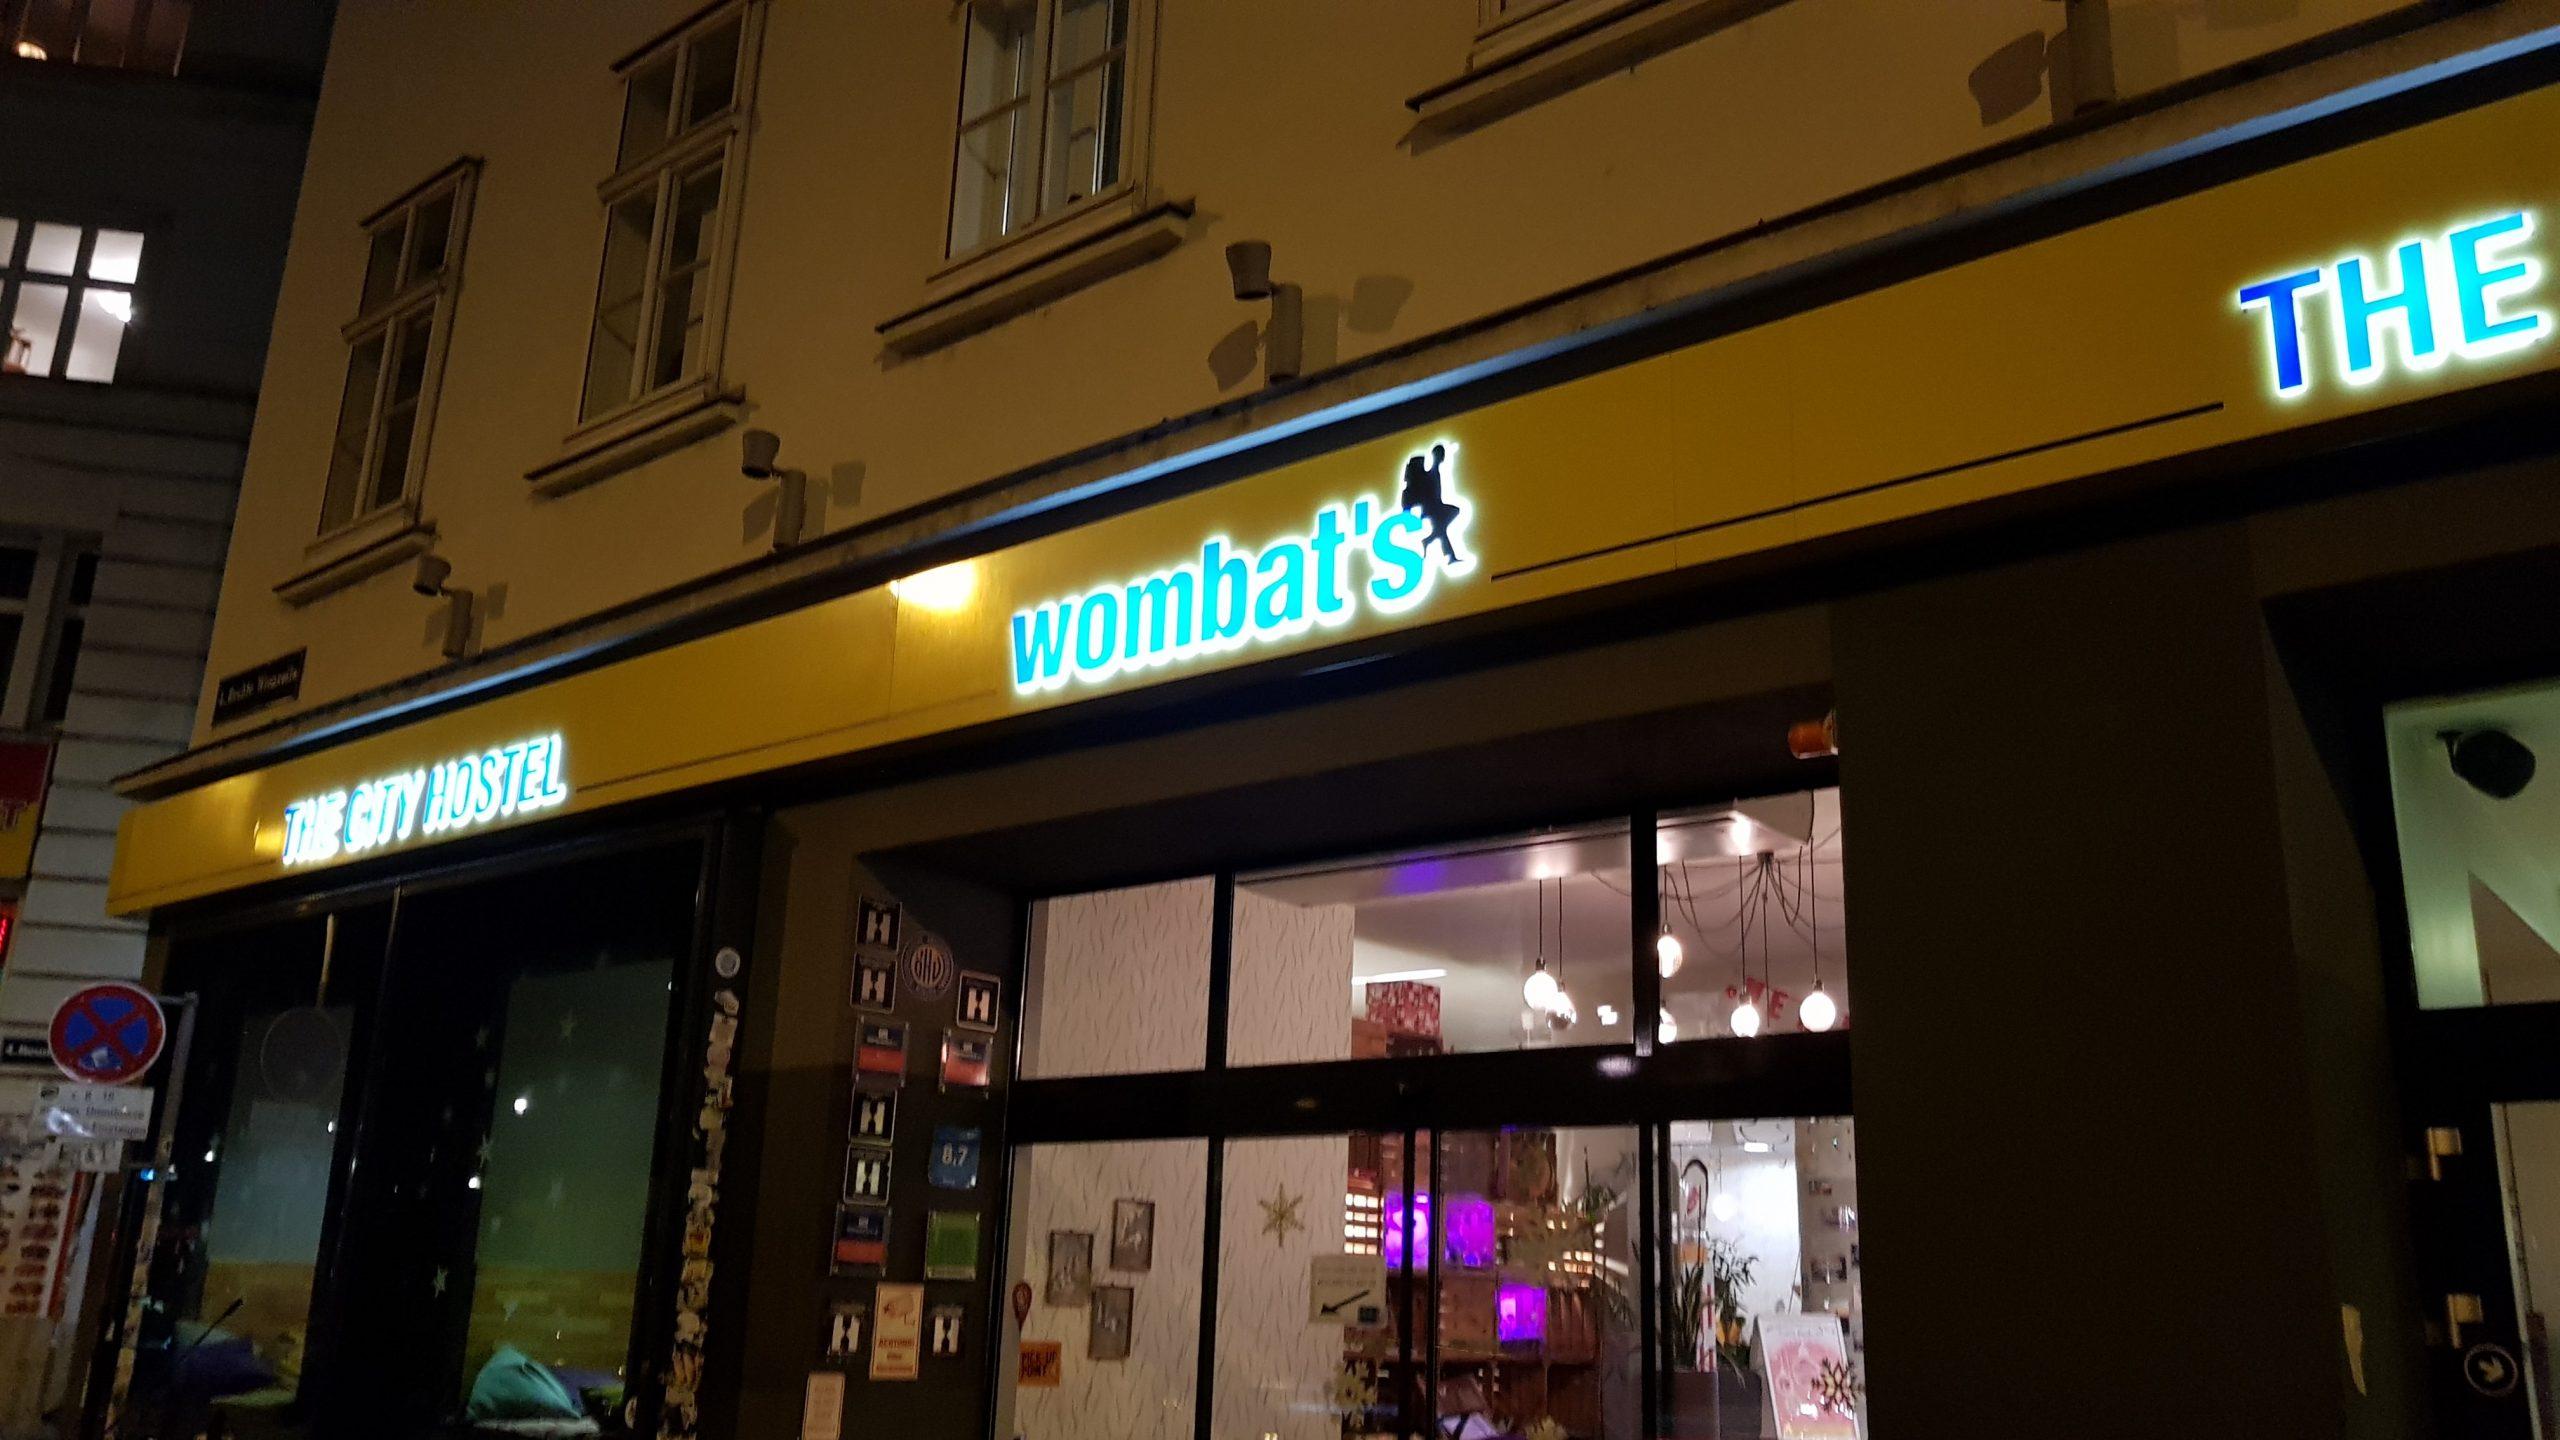 Fachada de hostel Wombat's de Viena